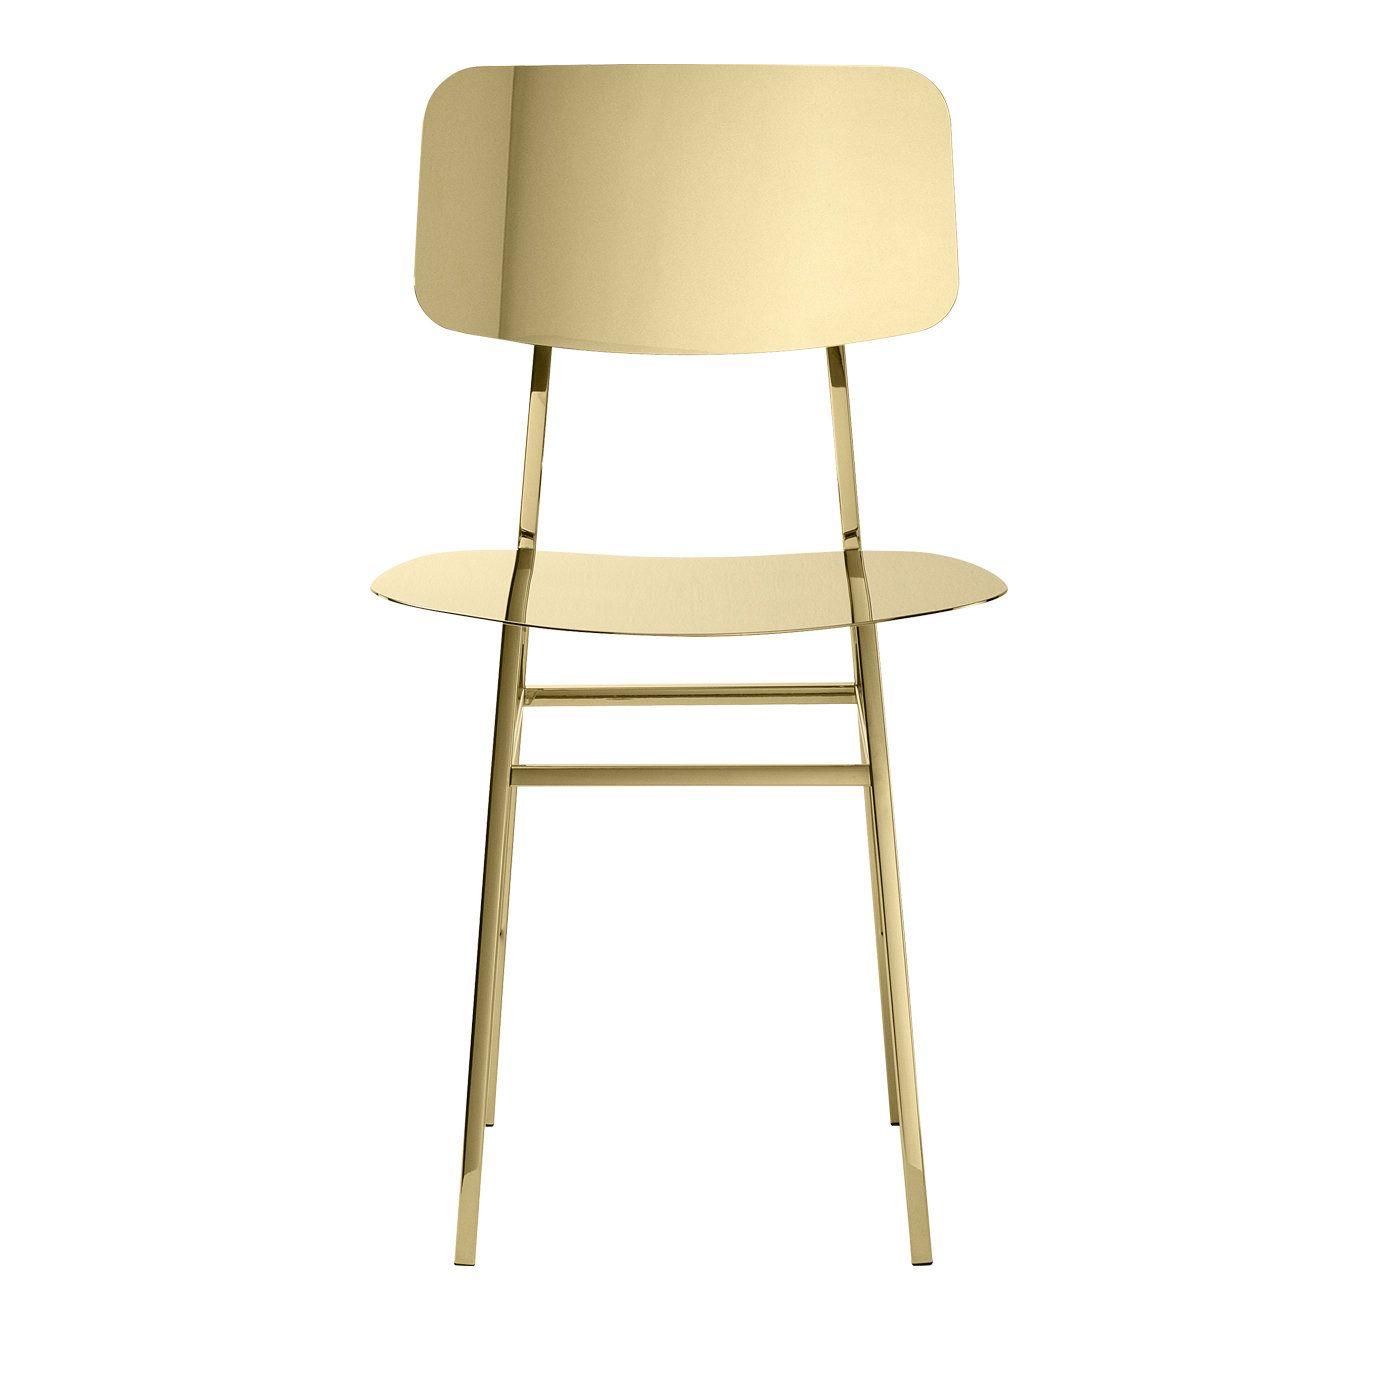 Miami Chair Satin Gold By Nika Zupanc In 2020 Miami Chair Minimal Furniture Chair